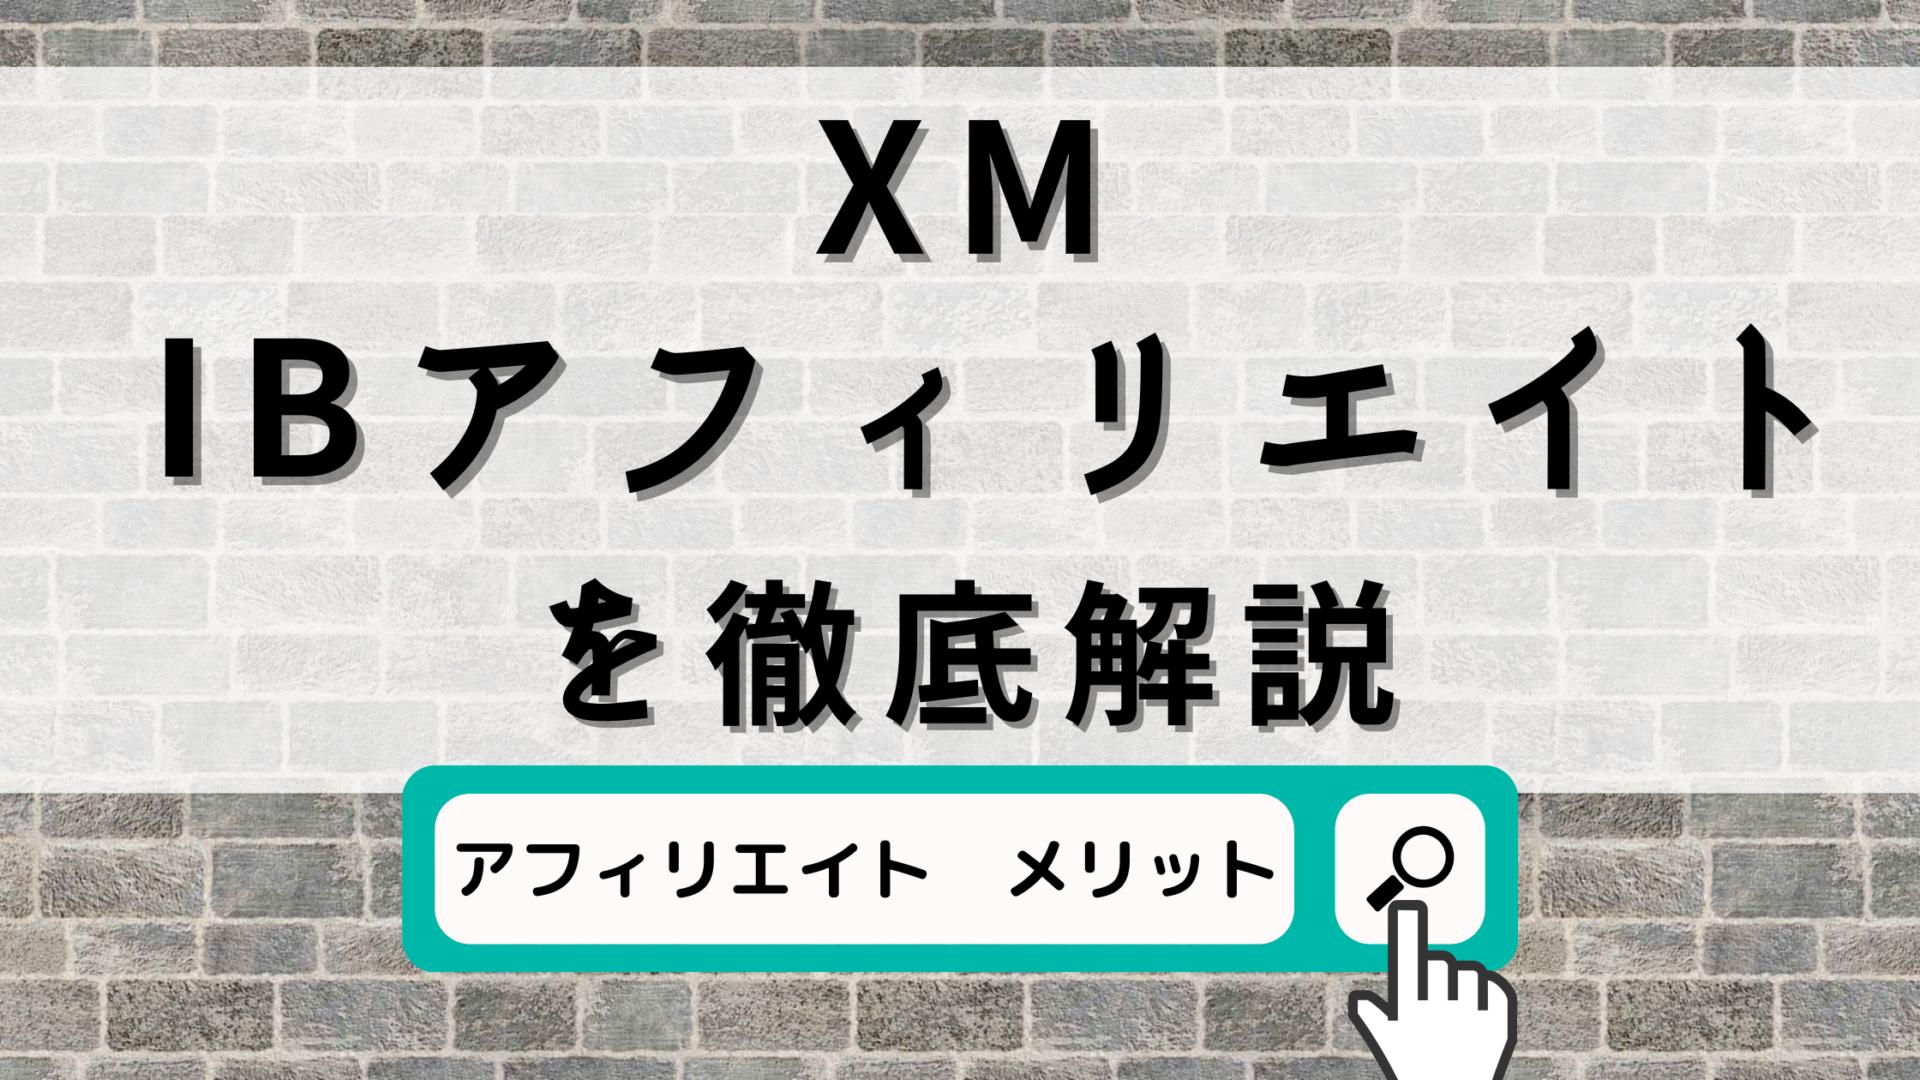 XMのIBアフィリエイトの仕組みは?パートナー報酬を徹底解説!